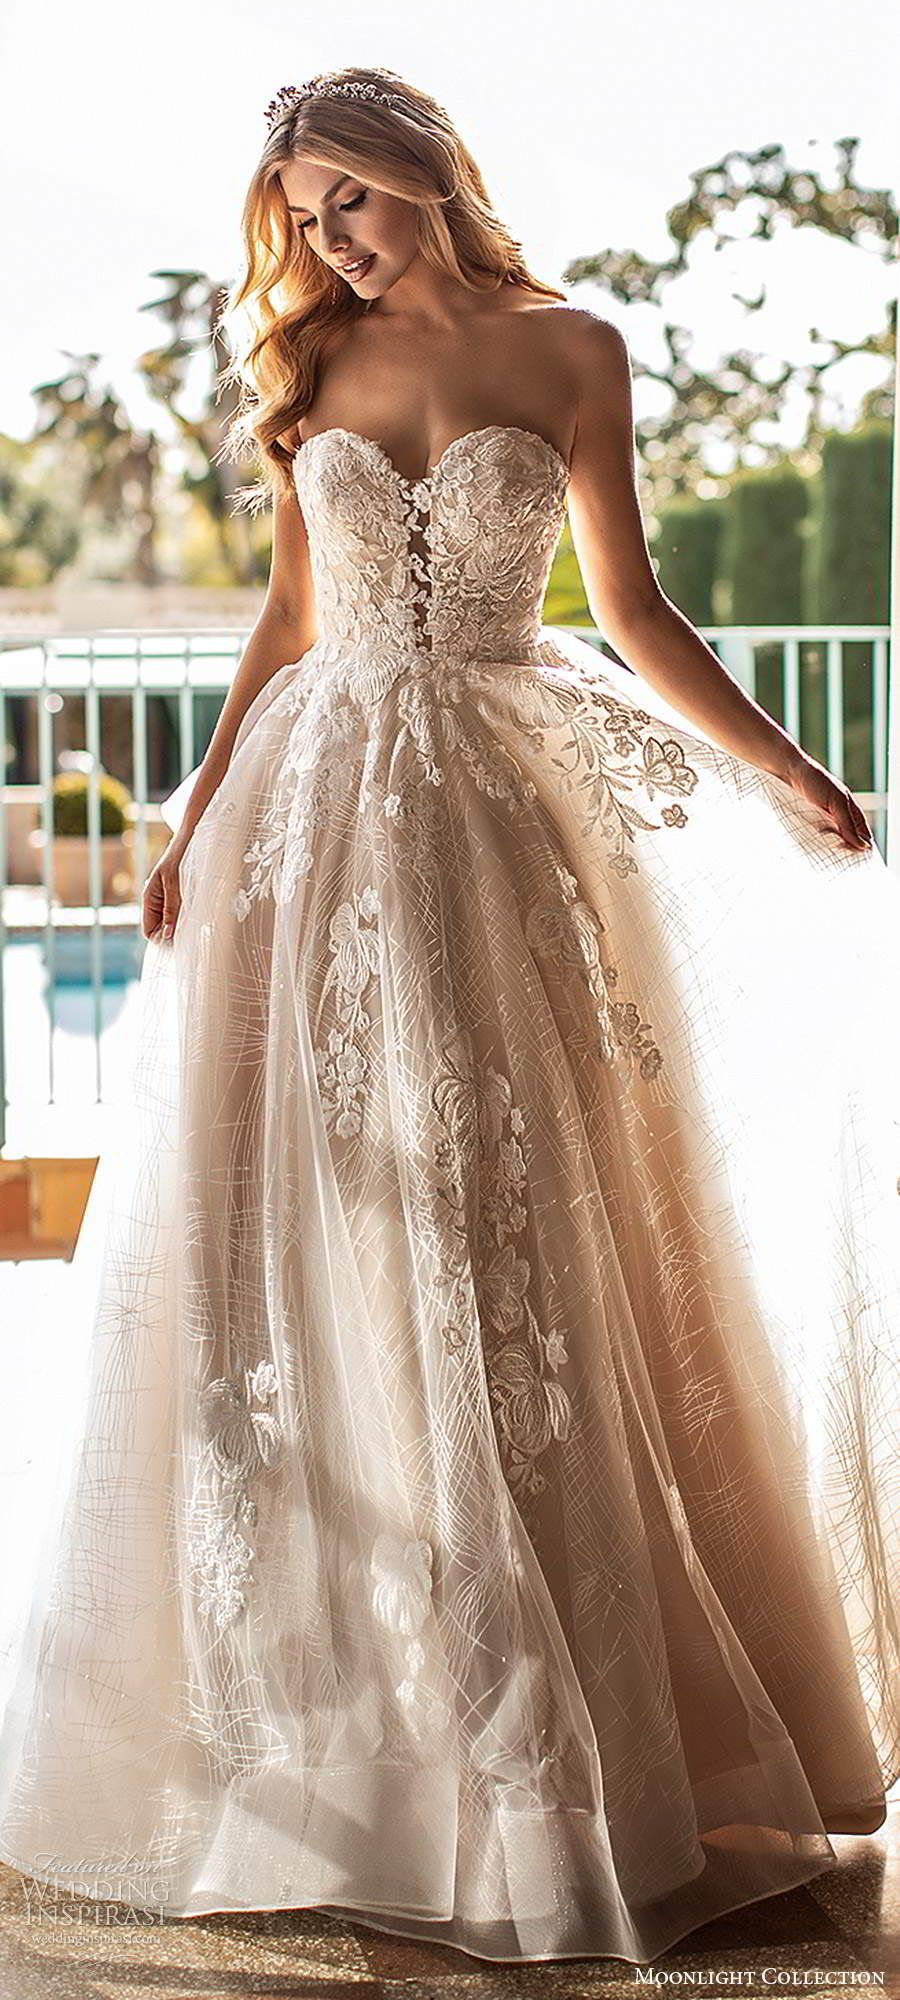 Moonlight Collection Fall 2020 Wedding Dresses Wedding Inspirasi In 2020 Beach Wedding Dress Dream Wedding Dress Mermaid Courthouse Wedding Dress Short